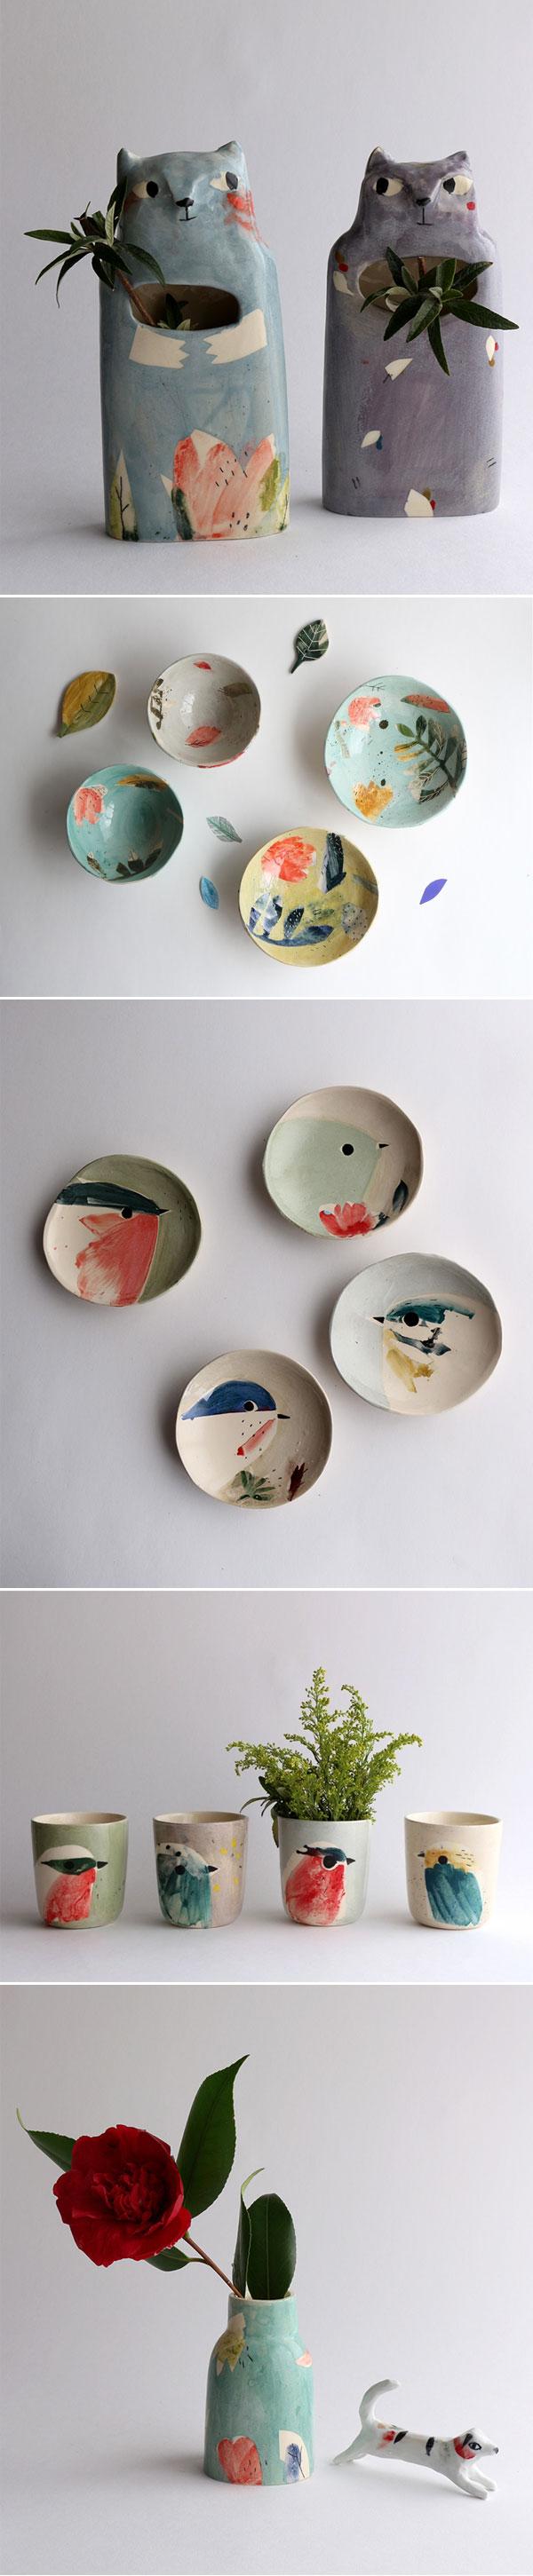 Elise Lefebvre Céramique | Cerâmicas